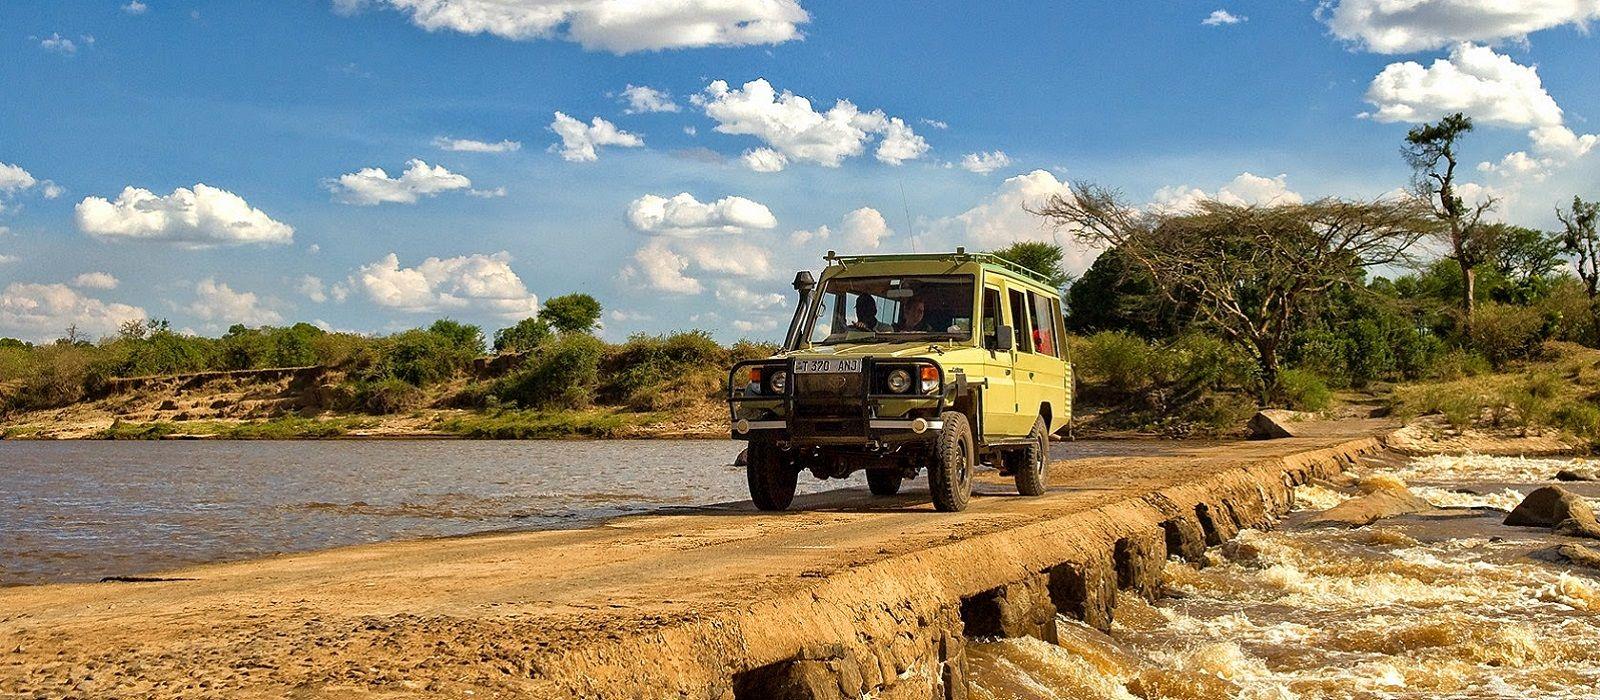 Safari Höhepunkte: Tansania, Simbabwe und Botswana Urlaub 3